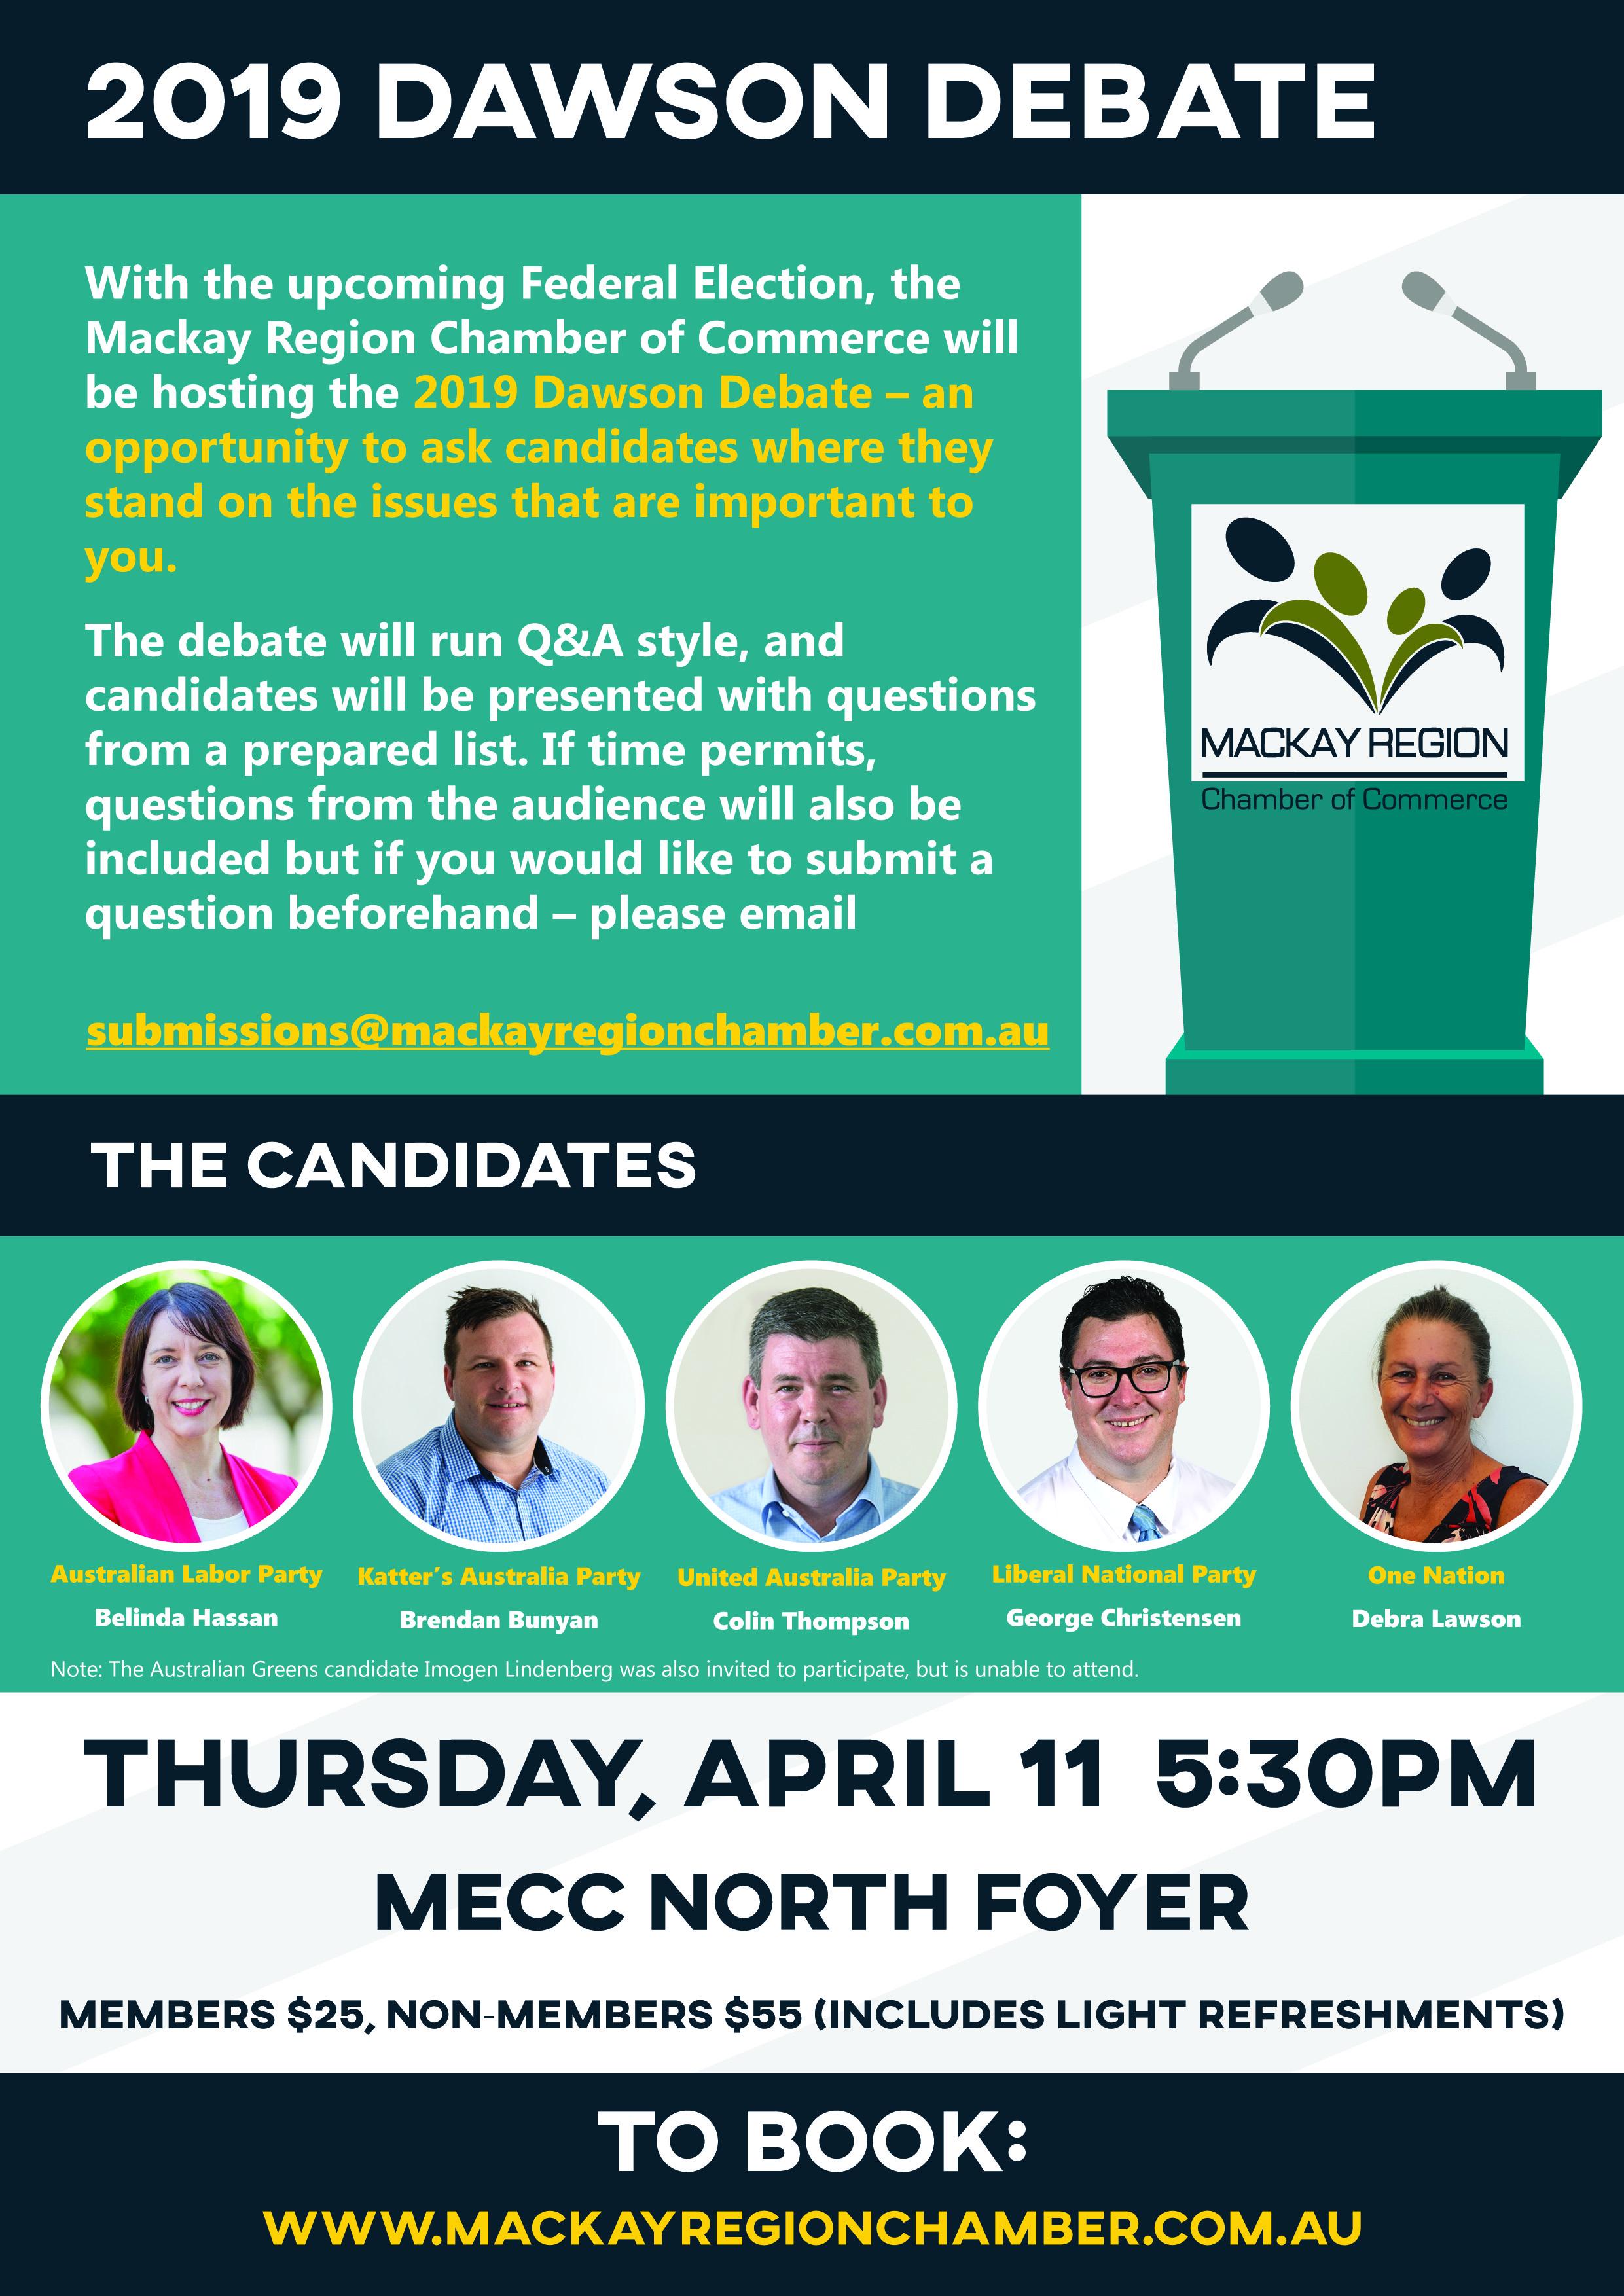 2019 Dawson Debate _A4 Flyer_Final_14.03-01.jpg